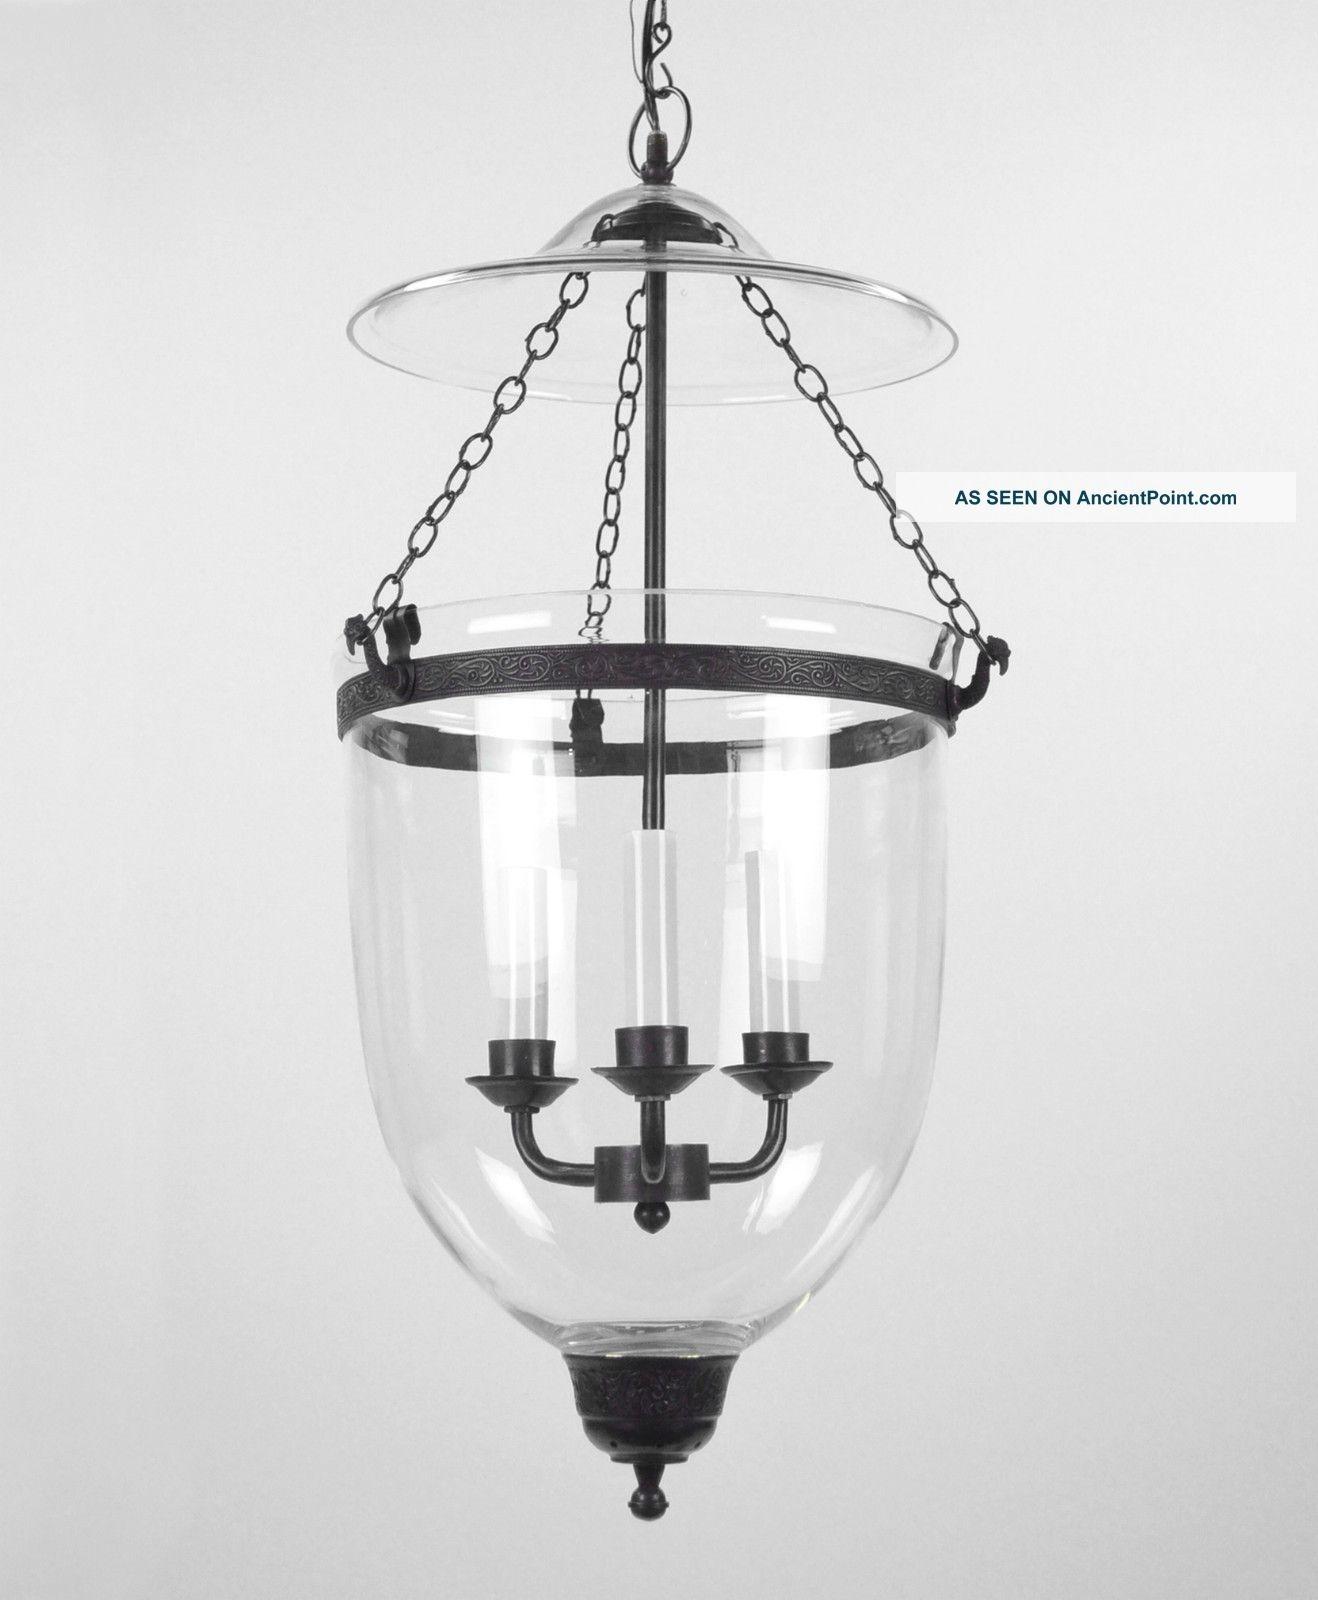 Large Bell Jar Light Chandelier Pendant Lantern Glass Colonial Old Regarding Antique Style Chandeliers (#8 of 12)